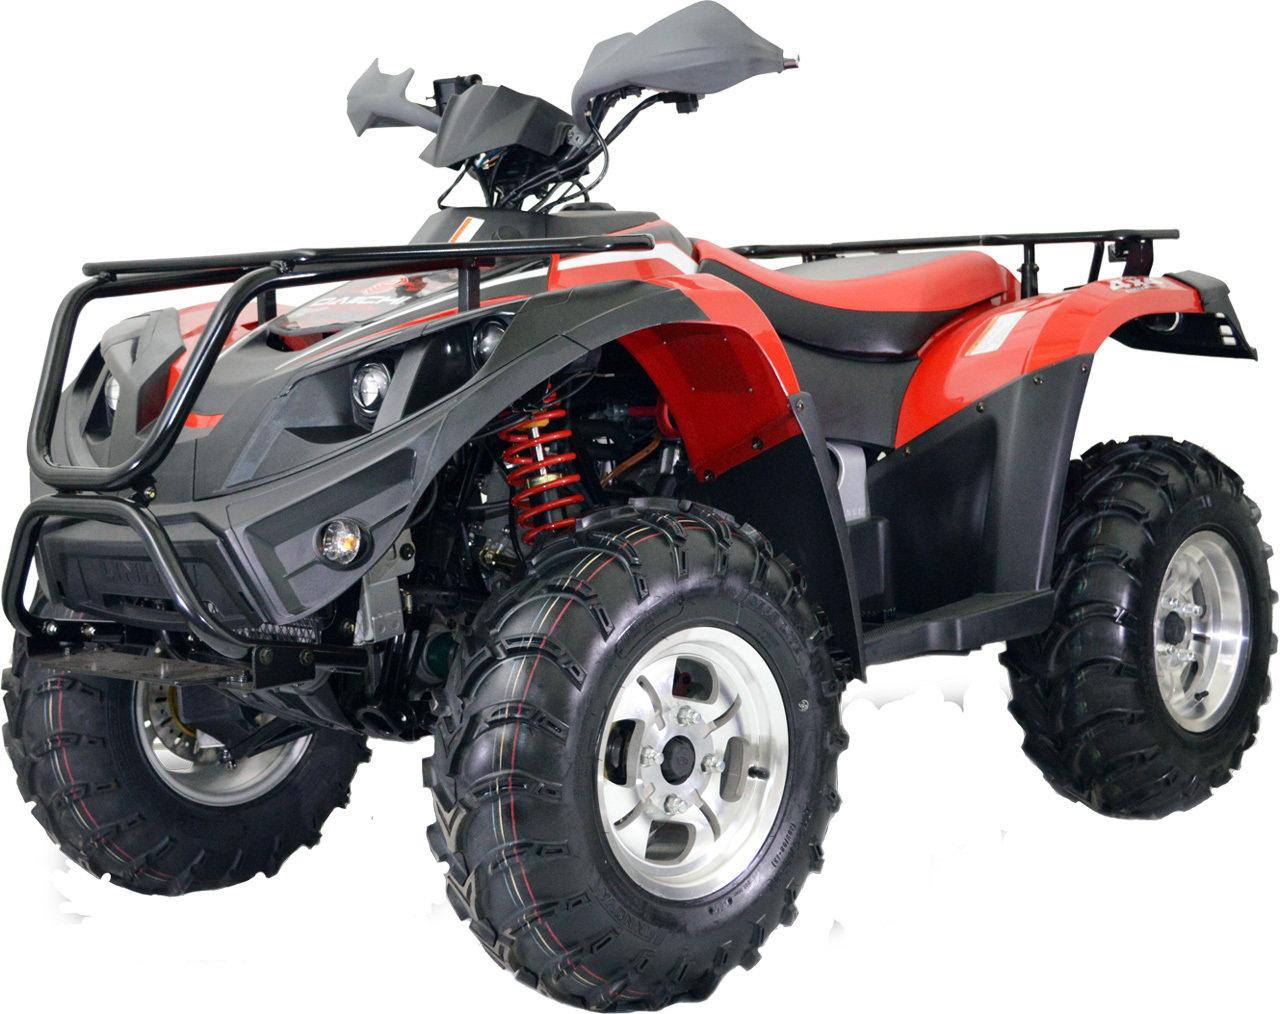 DAIICHI 400 SPORT ATV